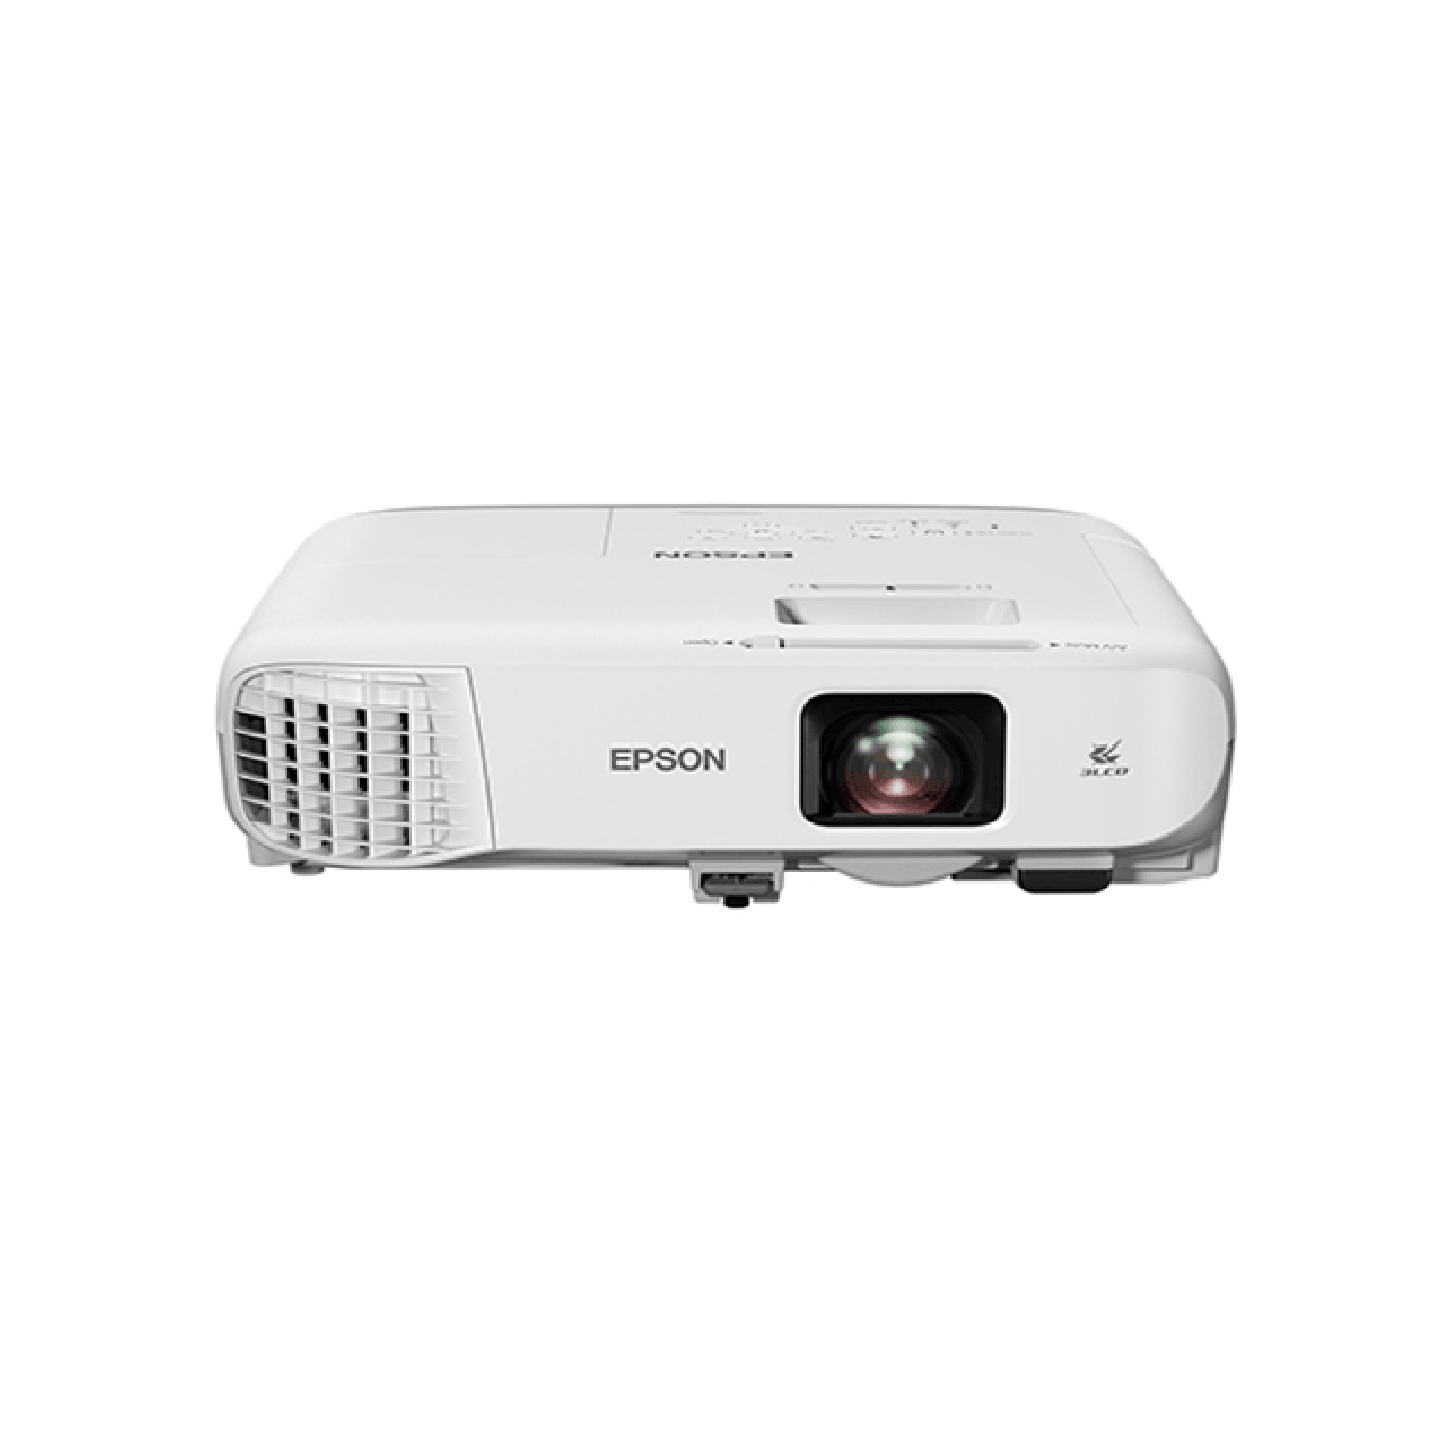 Epson Projector EB-980W WXGA